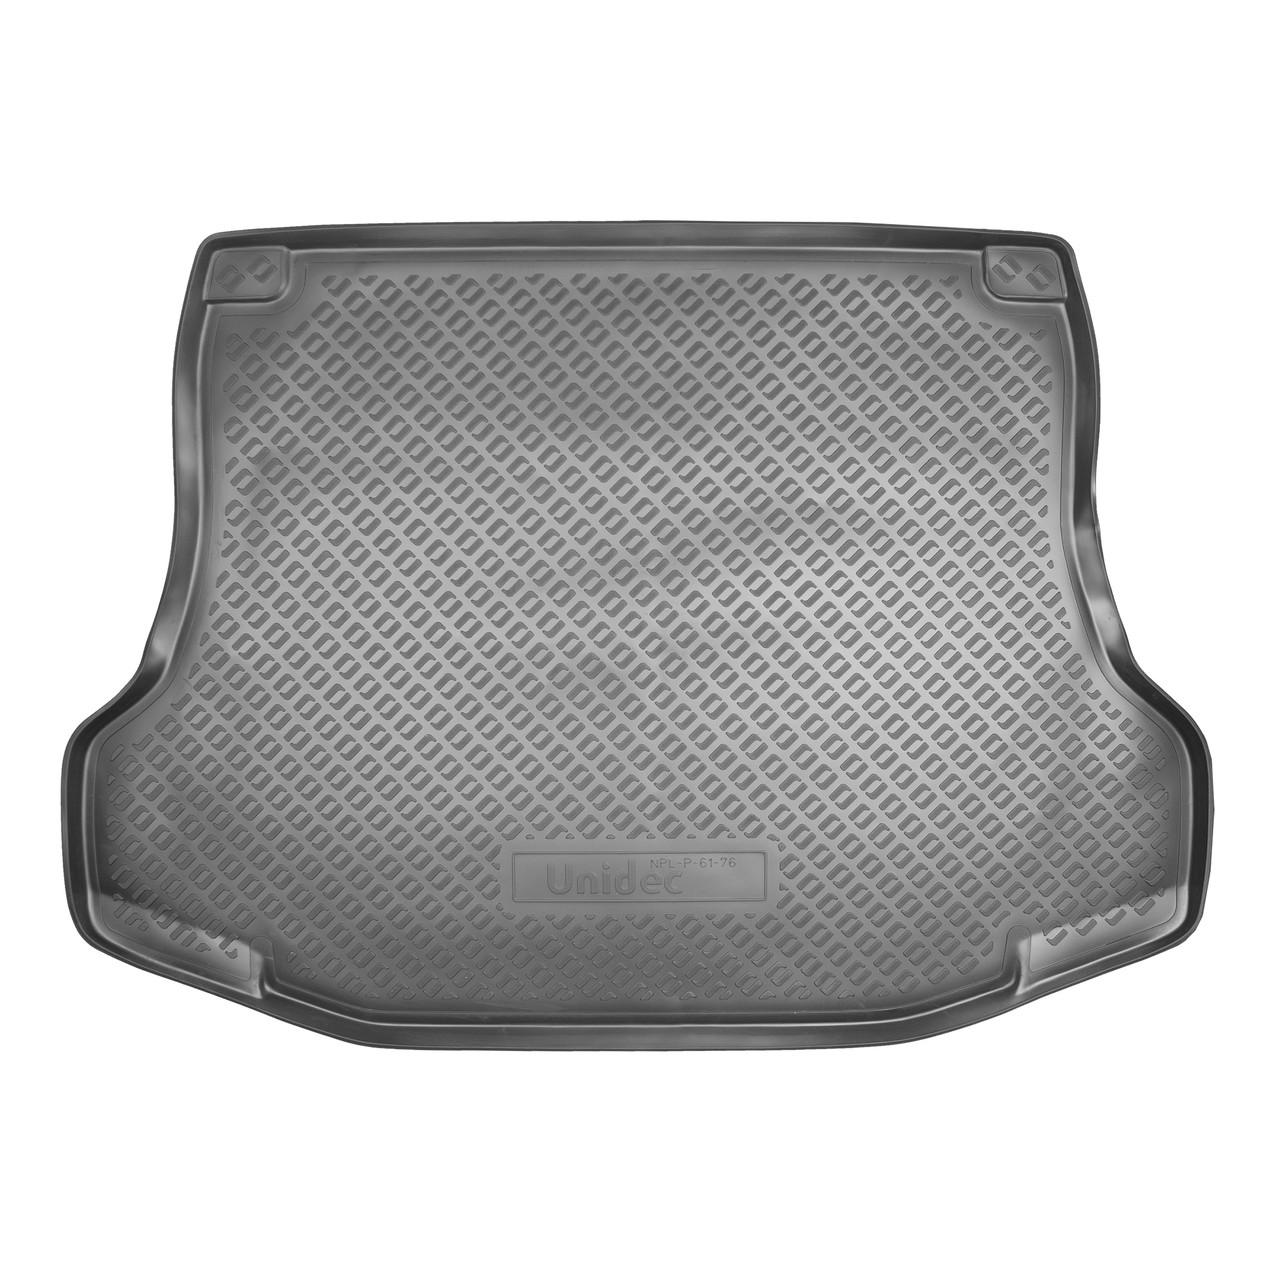 Коврик в багажник Nissan Tiida SD (2007)